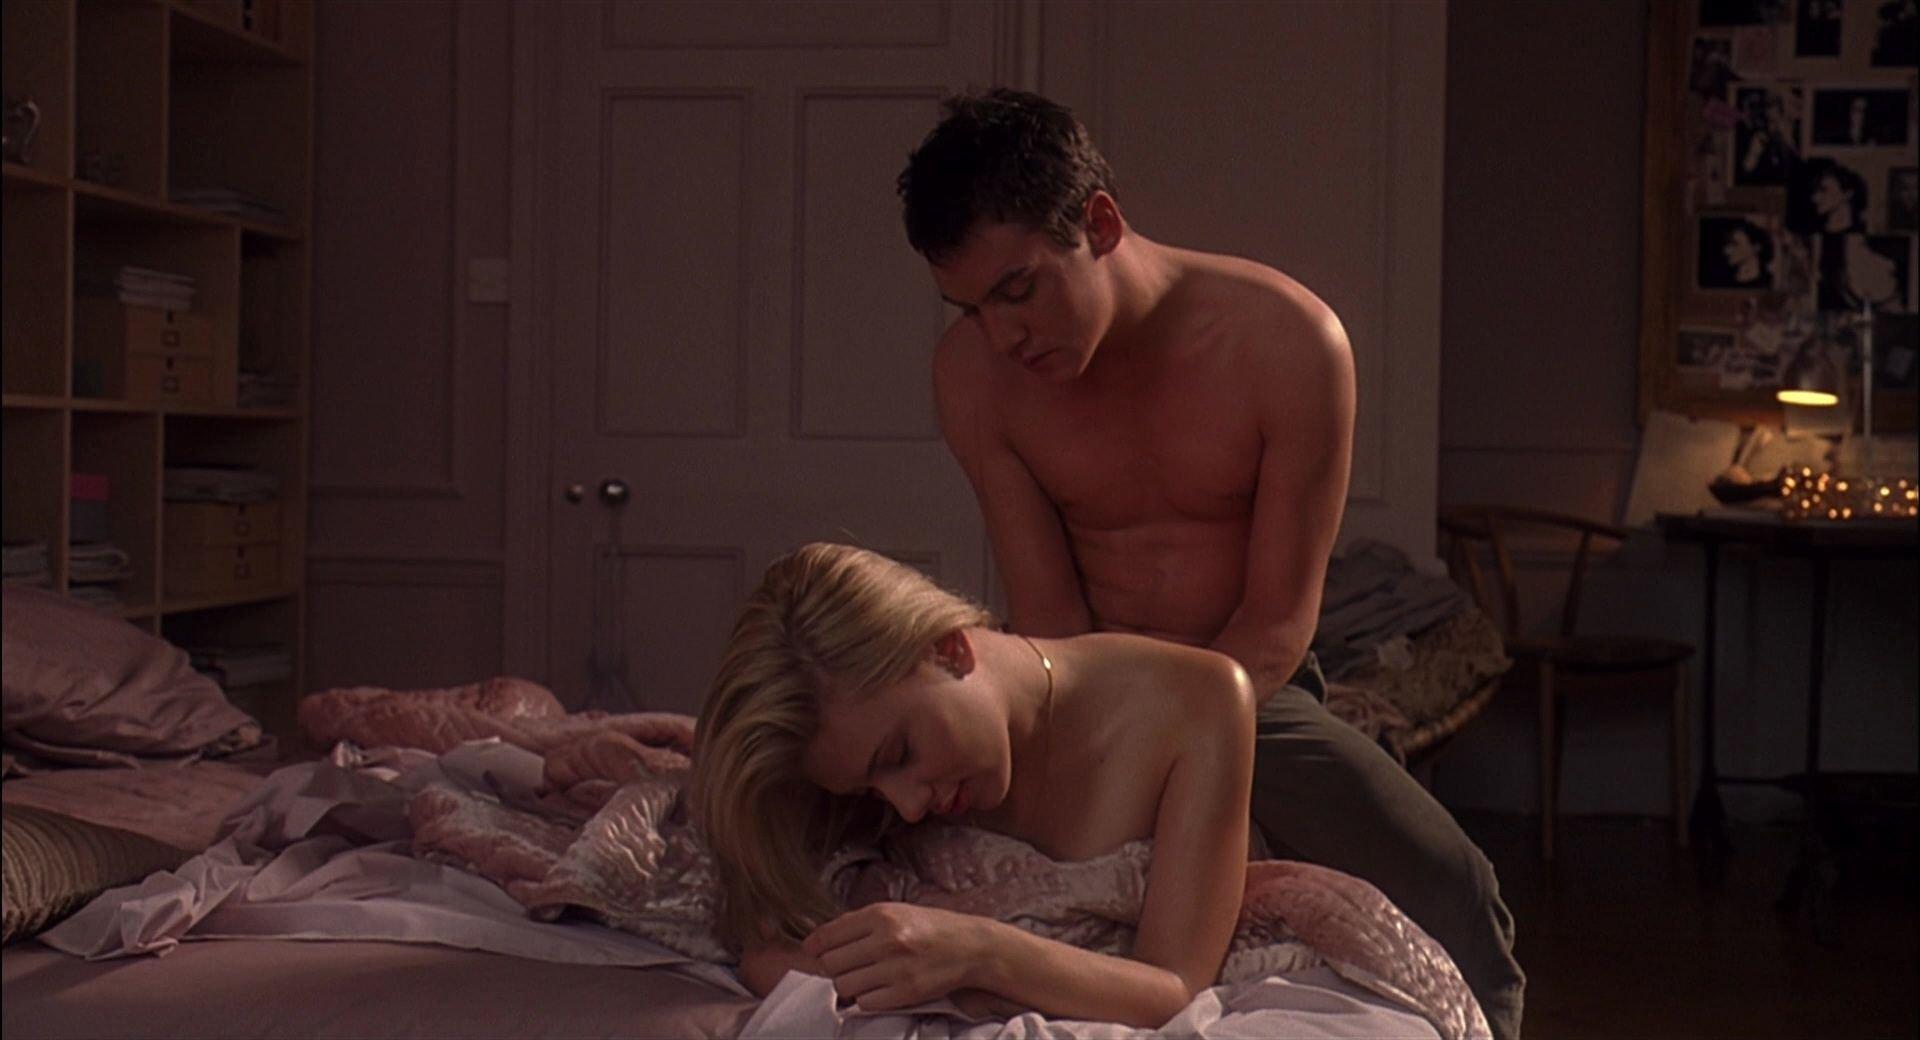 Tits Scarlett Johansson Nude Sex Tape Png